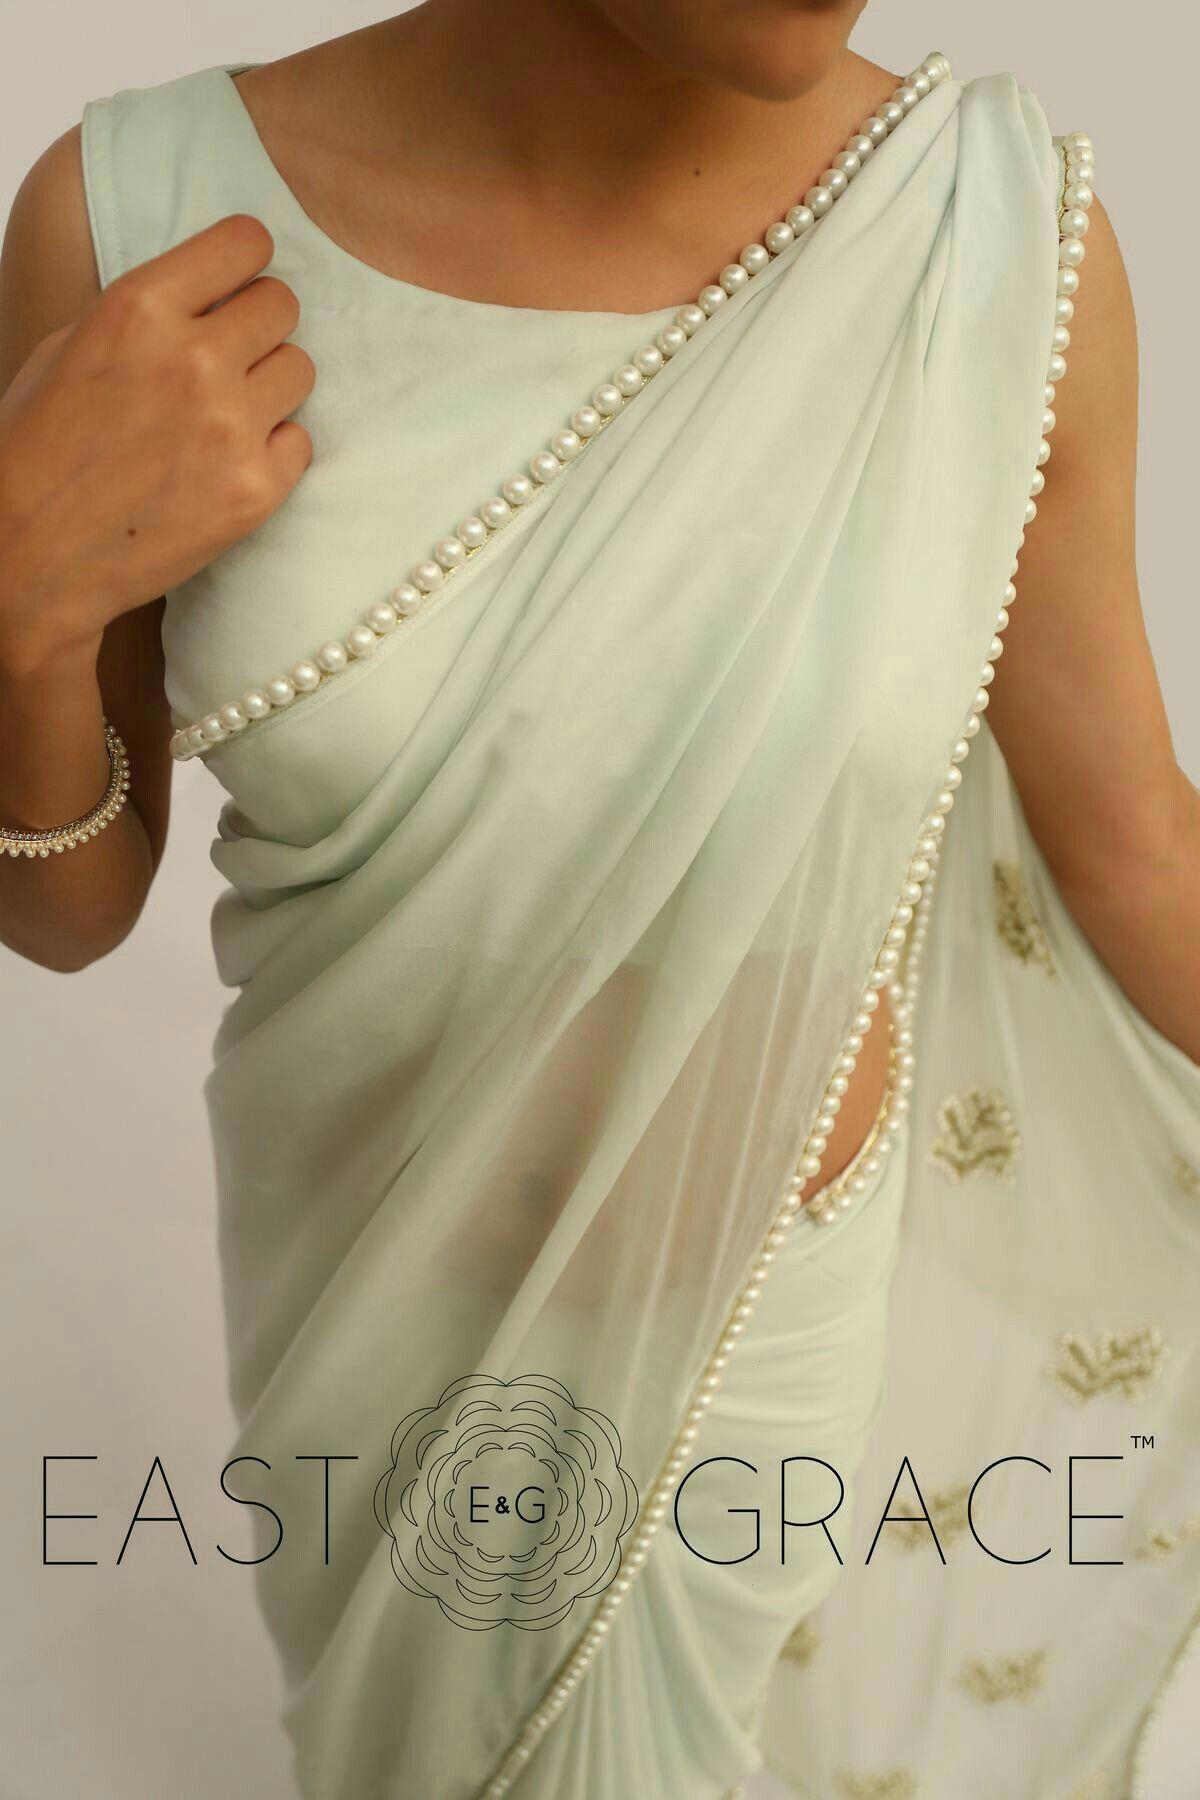 Harga Sari Eg Termurah 2018 Manzone Id Constitution Tshirt White Putih L Pin By Sereena Thomas On Indian Clothes Pinterest Saree Chiffon Pearl Lace Is A